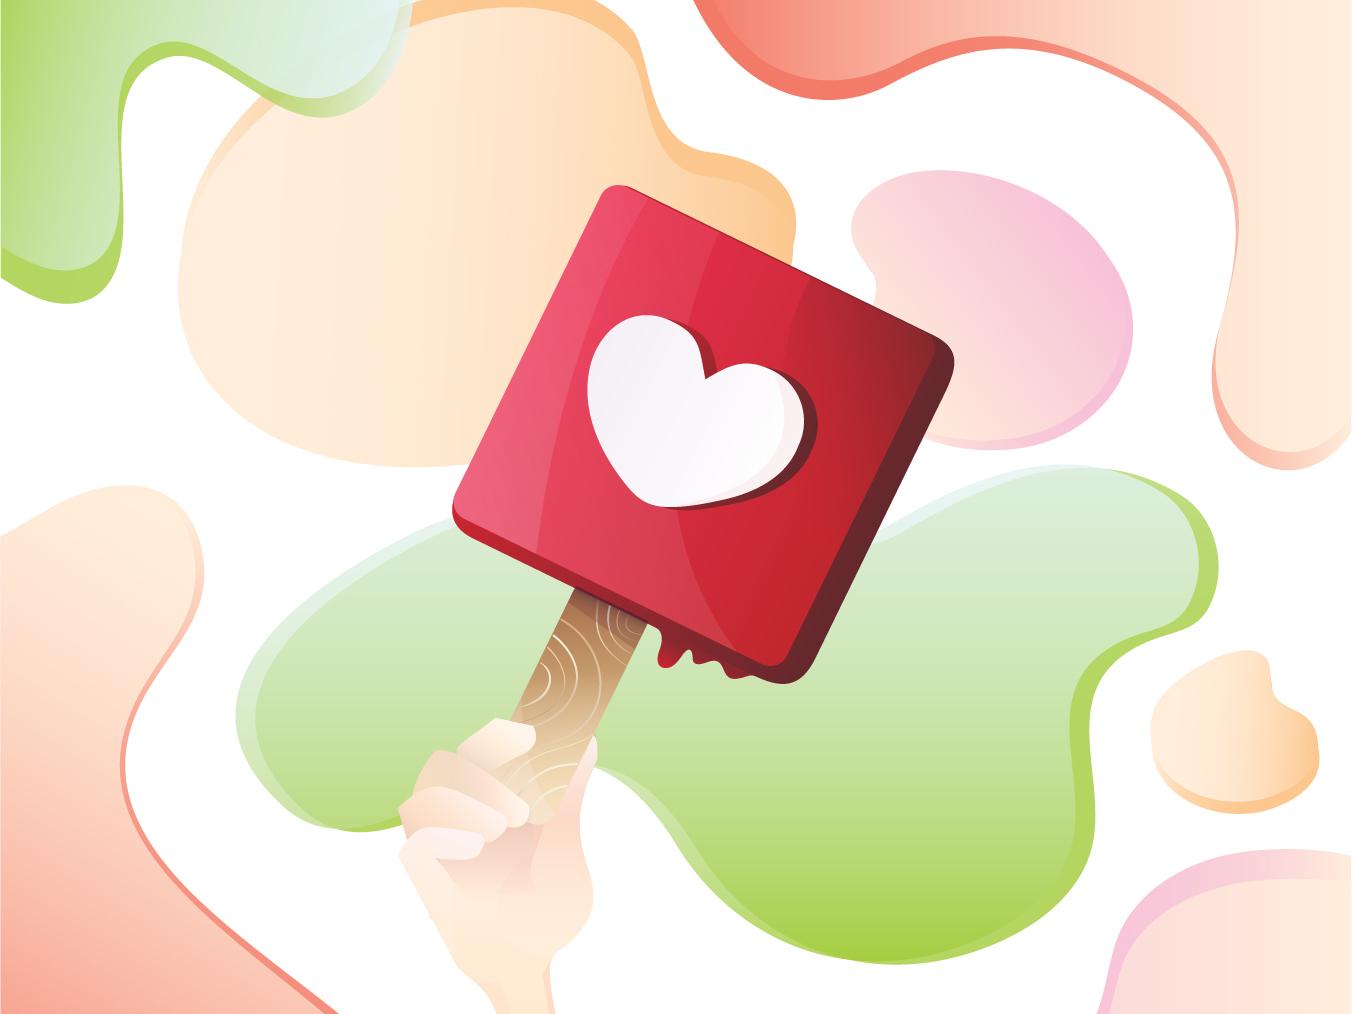 Ice Cream modern slick gradient colorful design blobs heart shaped heart facebook instagram like likes hand summer popsicle icecream web icon vector design illustration